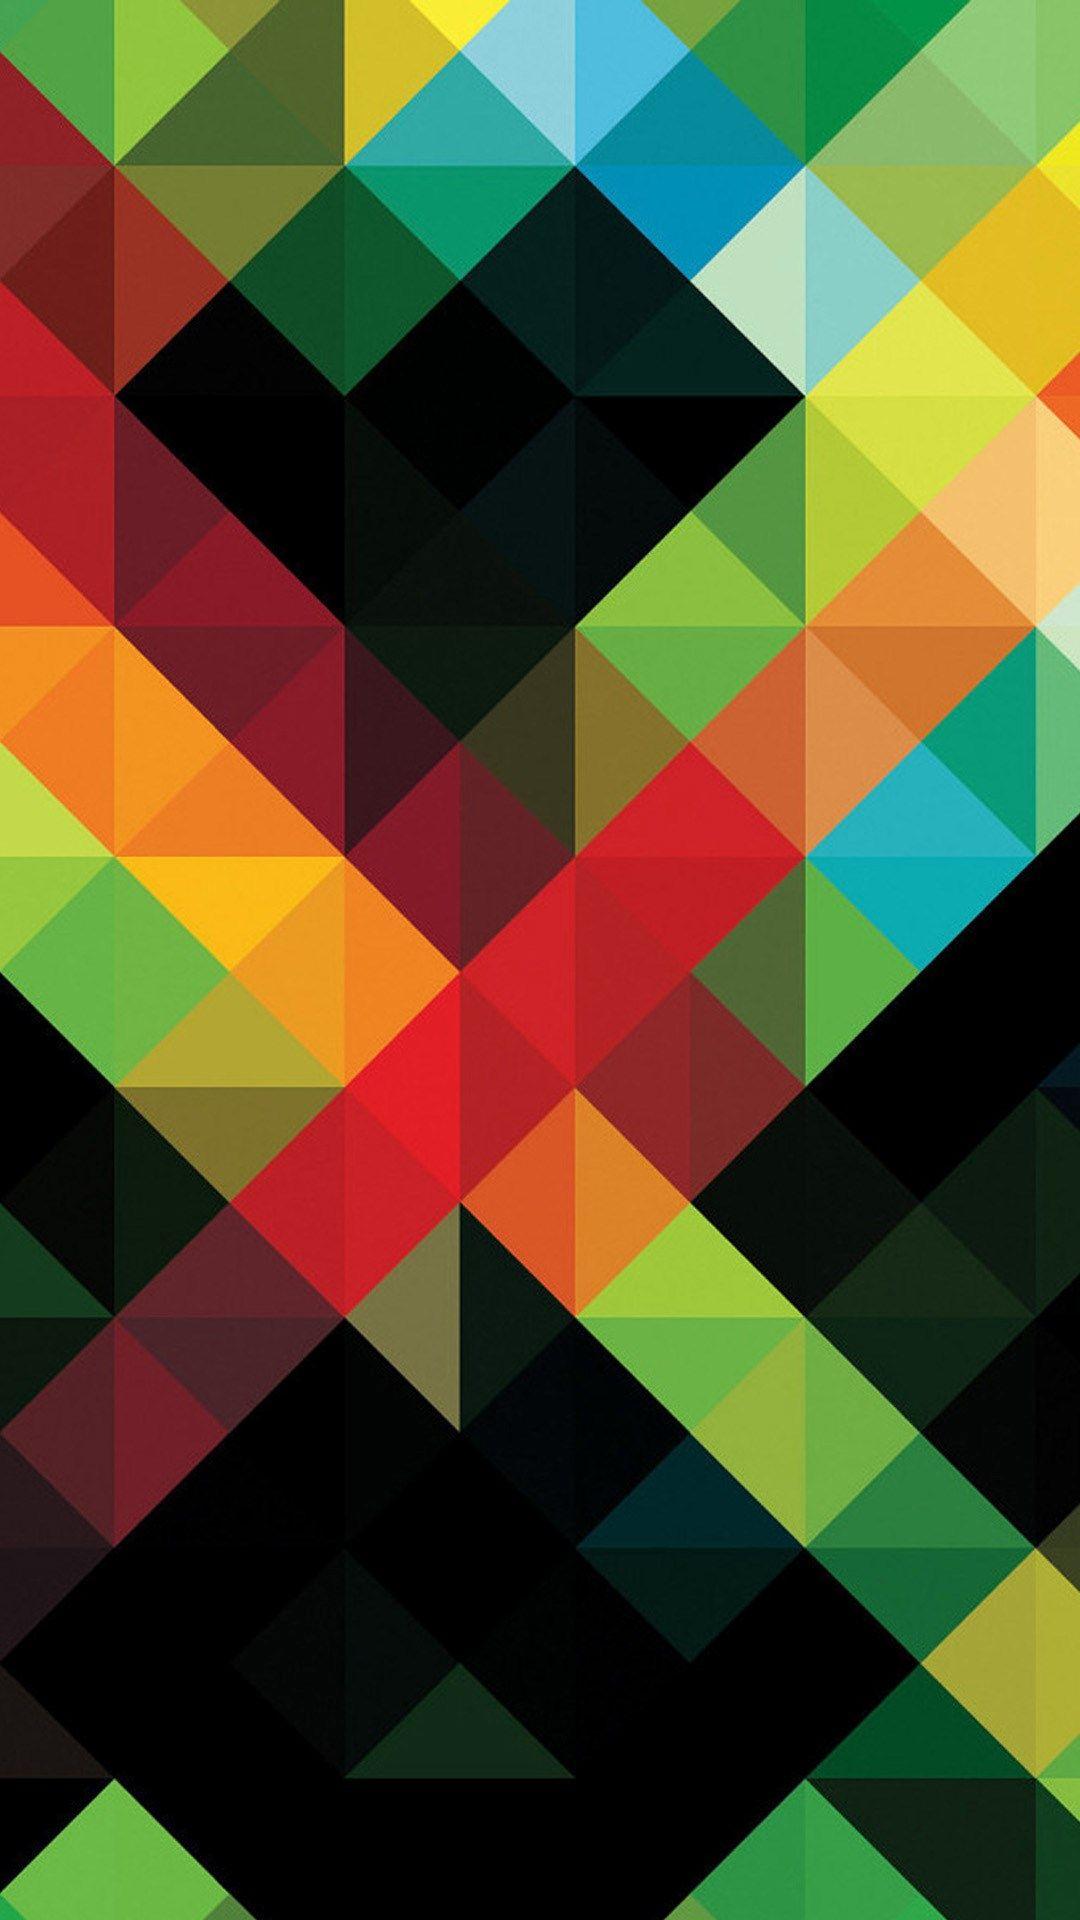 abstract slash iphone 6 plus wallpaper o oshenka